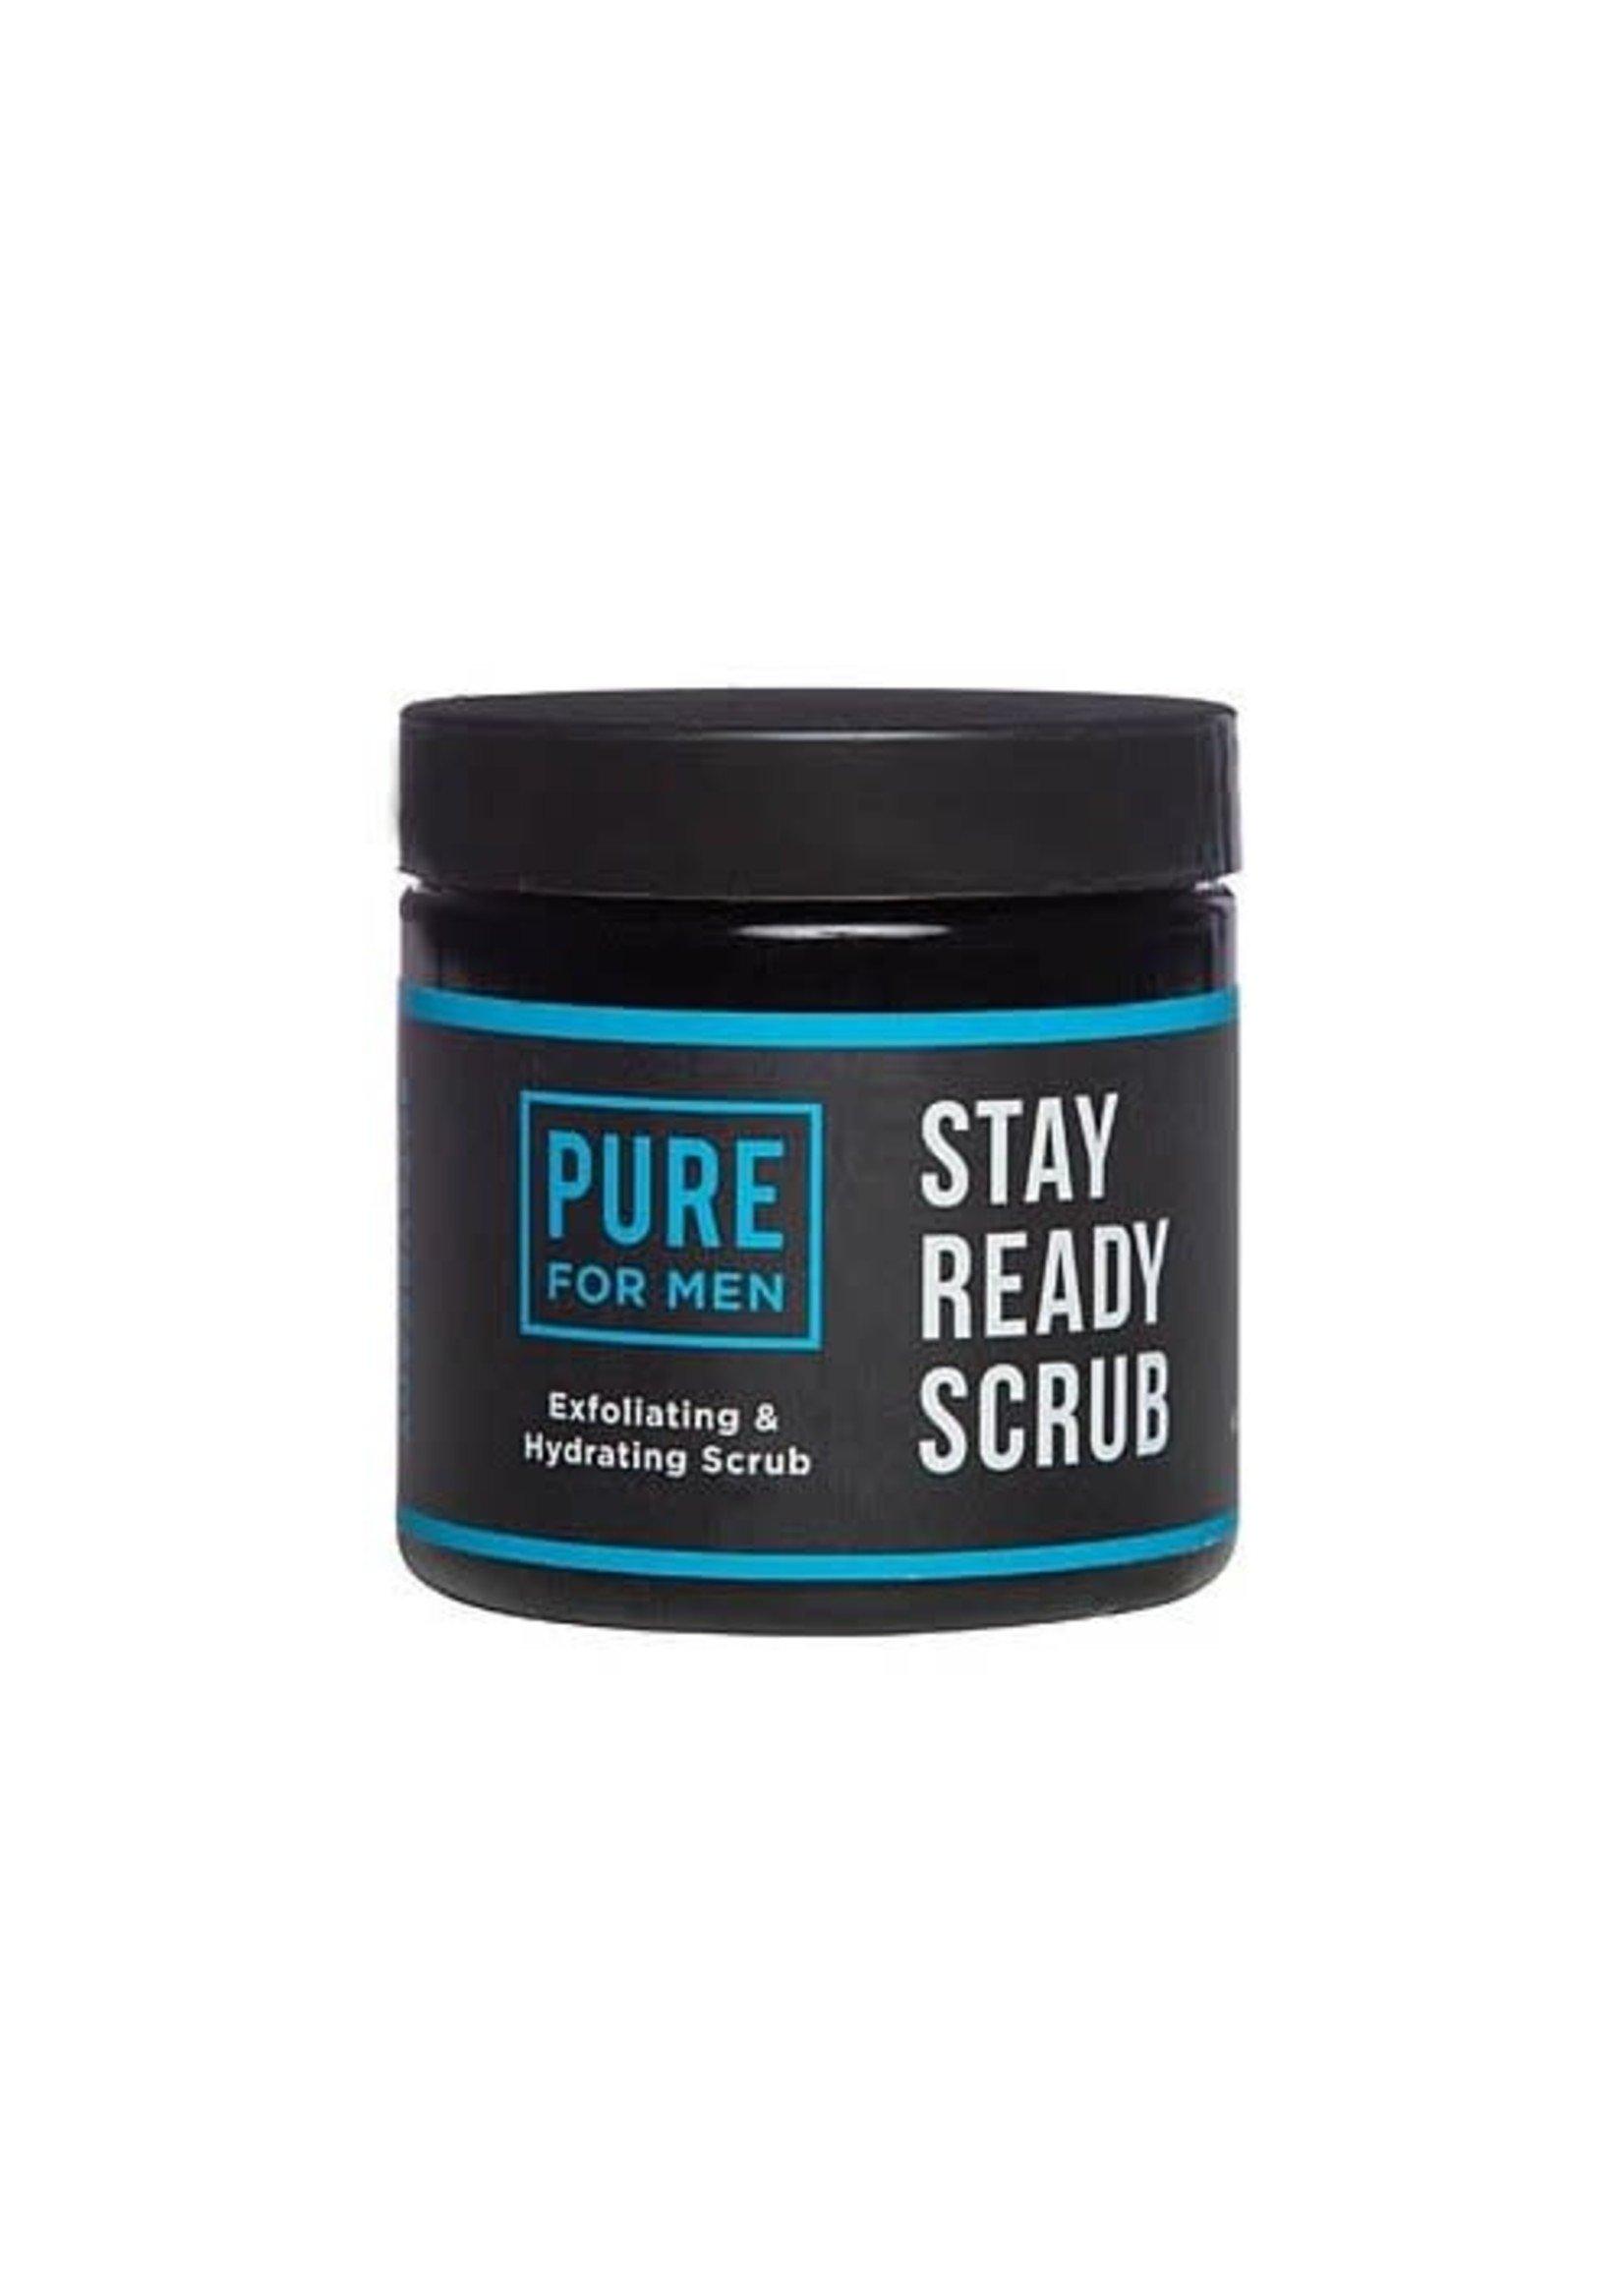 Pure for Men Pure for Men Stay Ready Scrub 9 oz